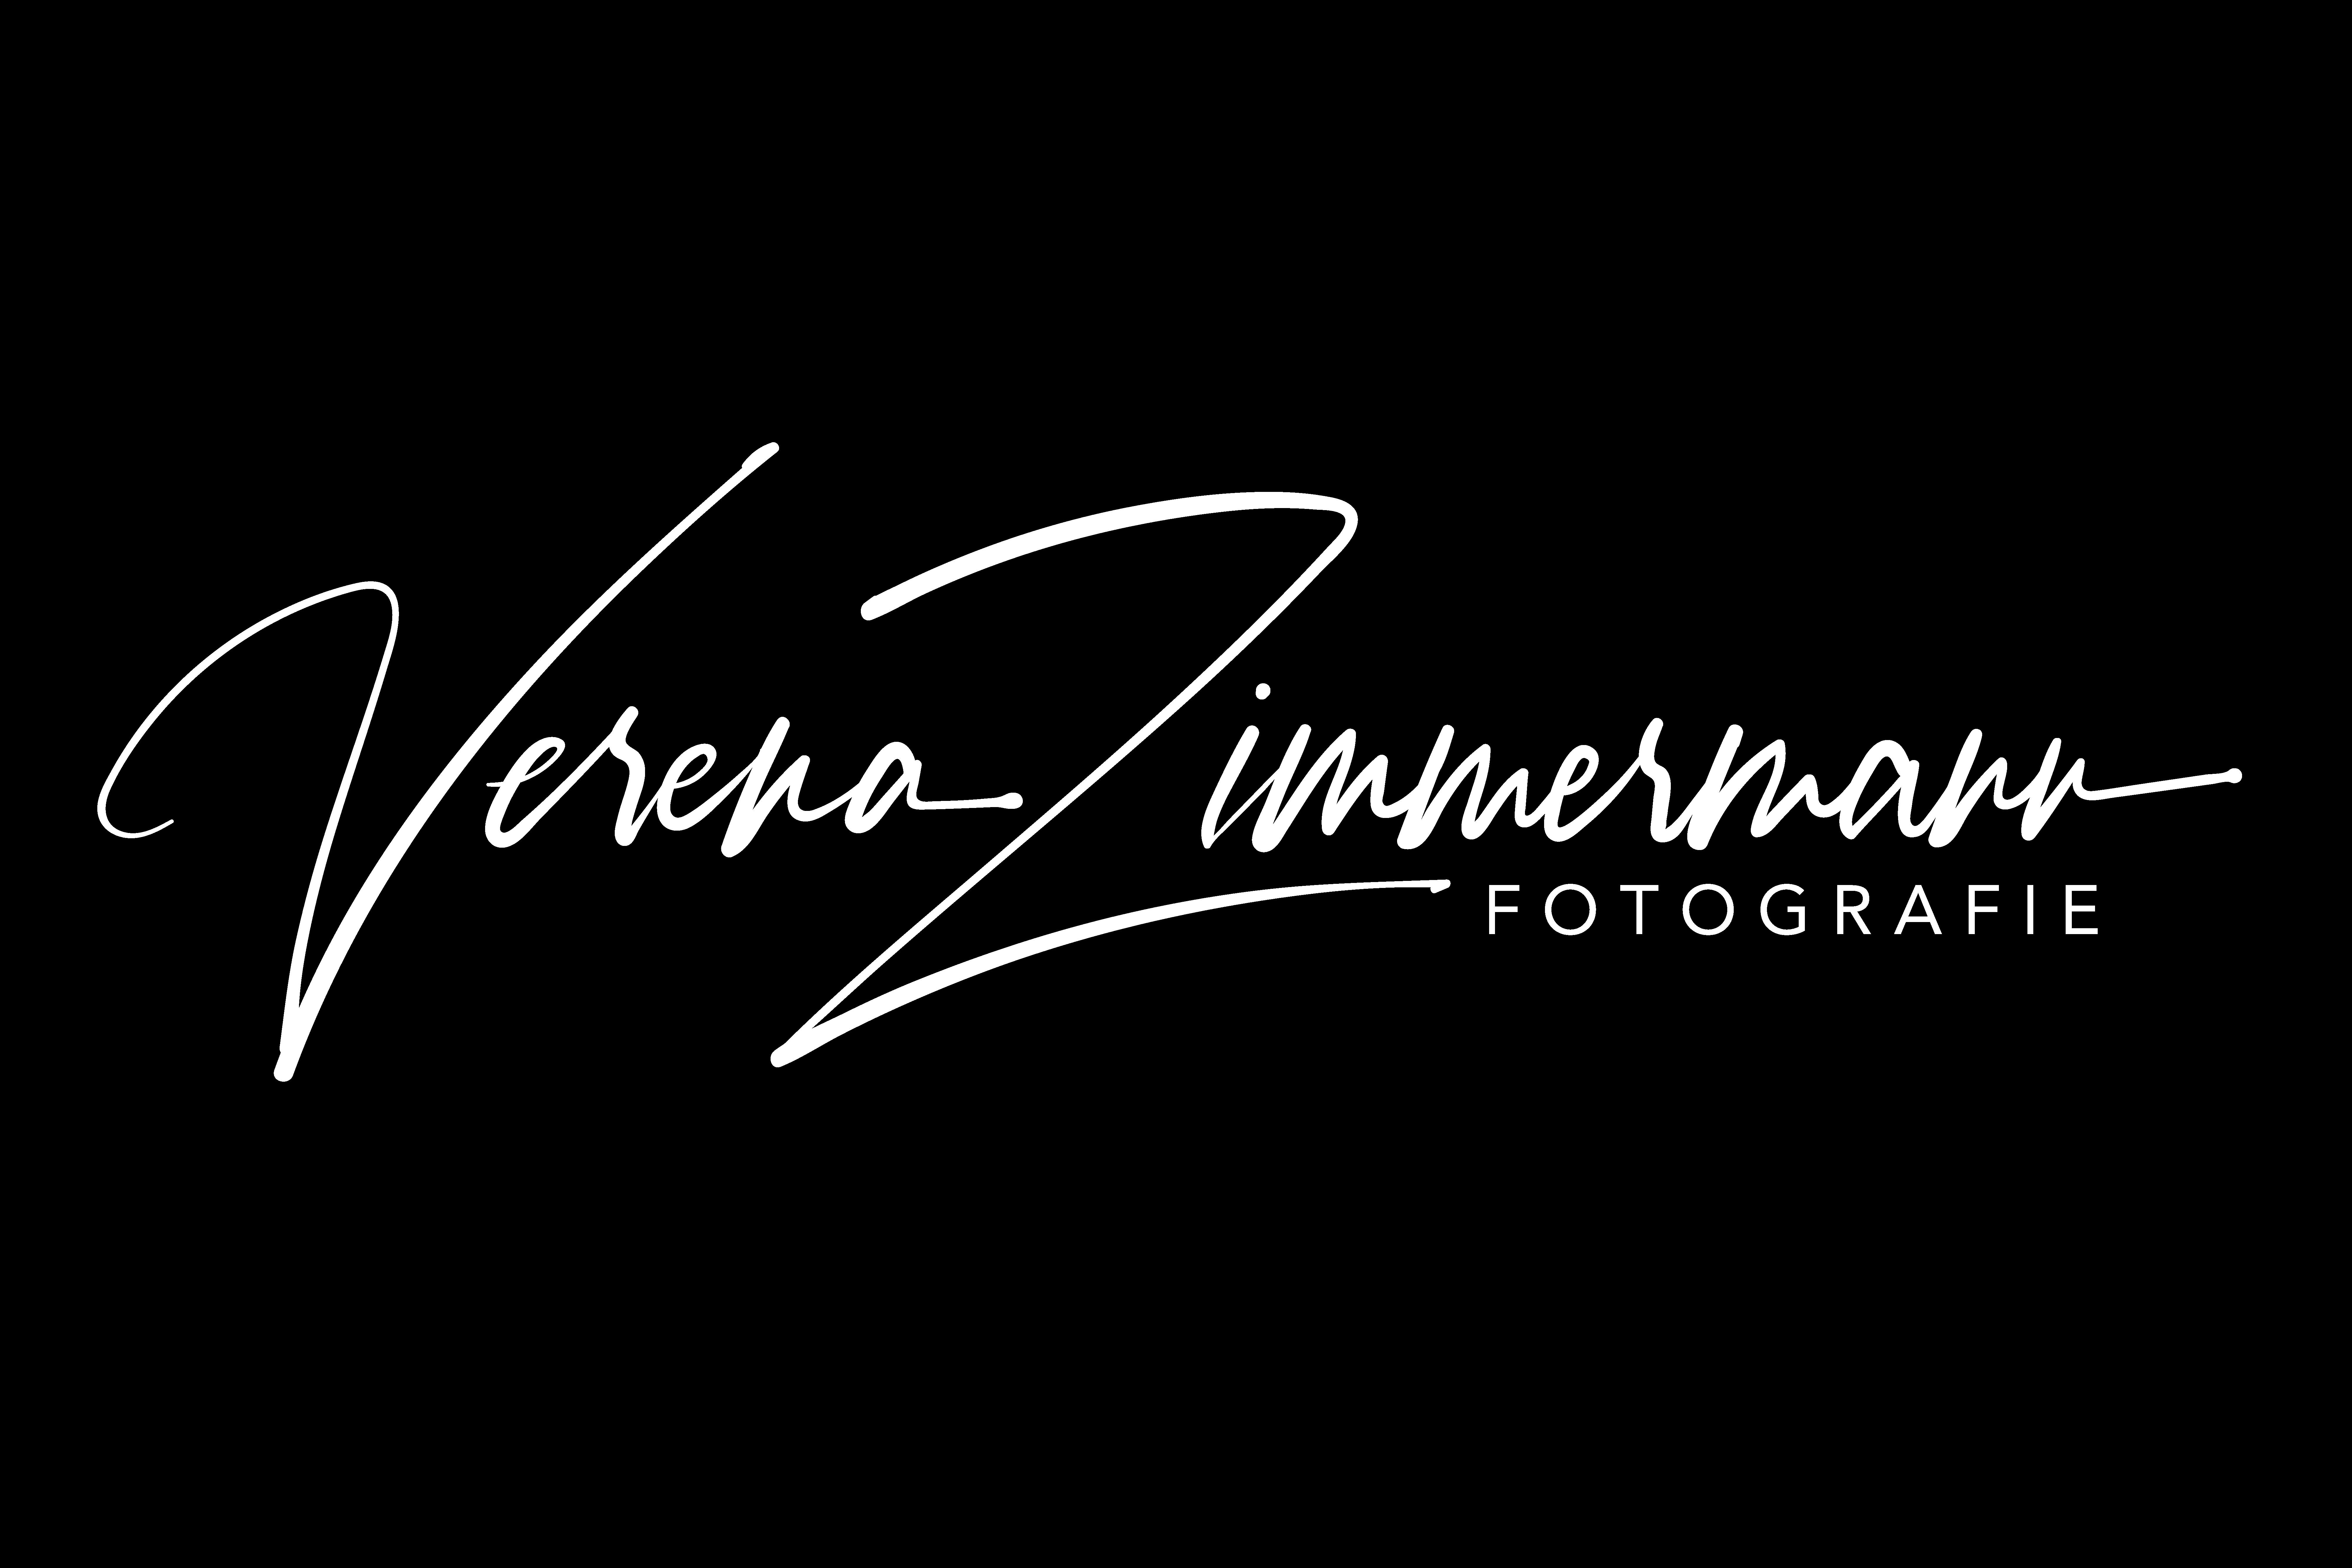 Verena Zimmermann Fotografie